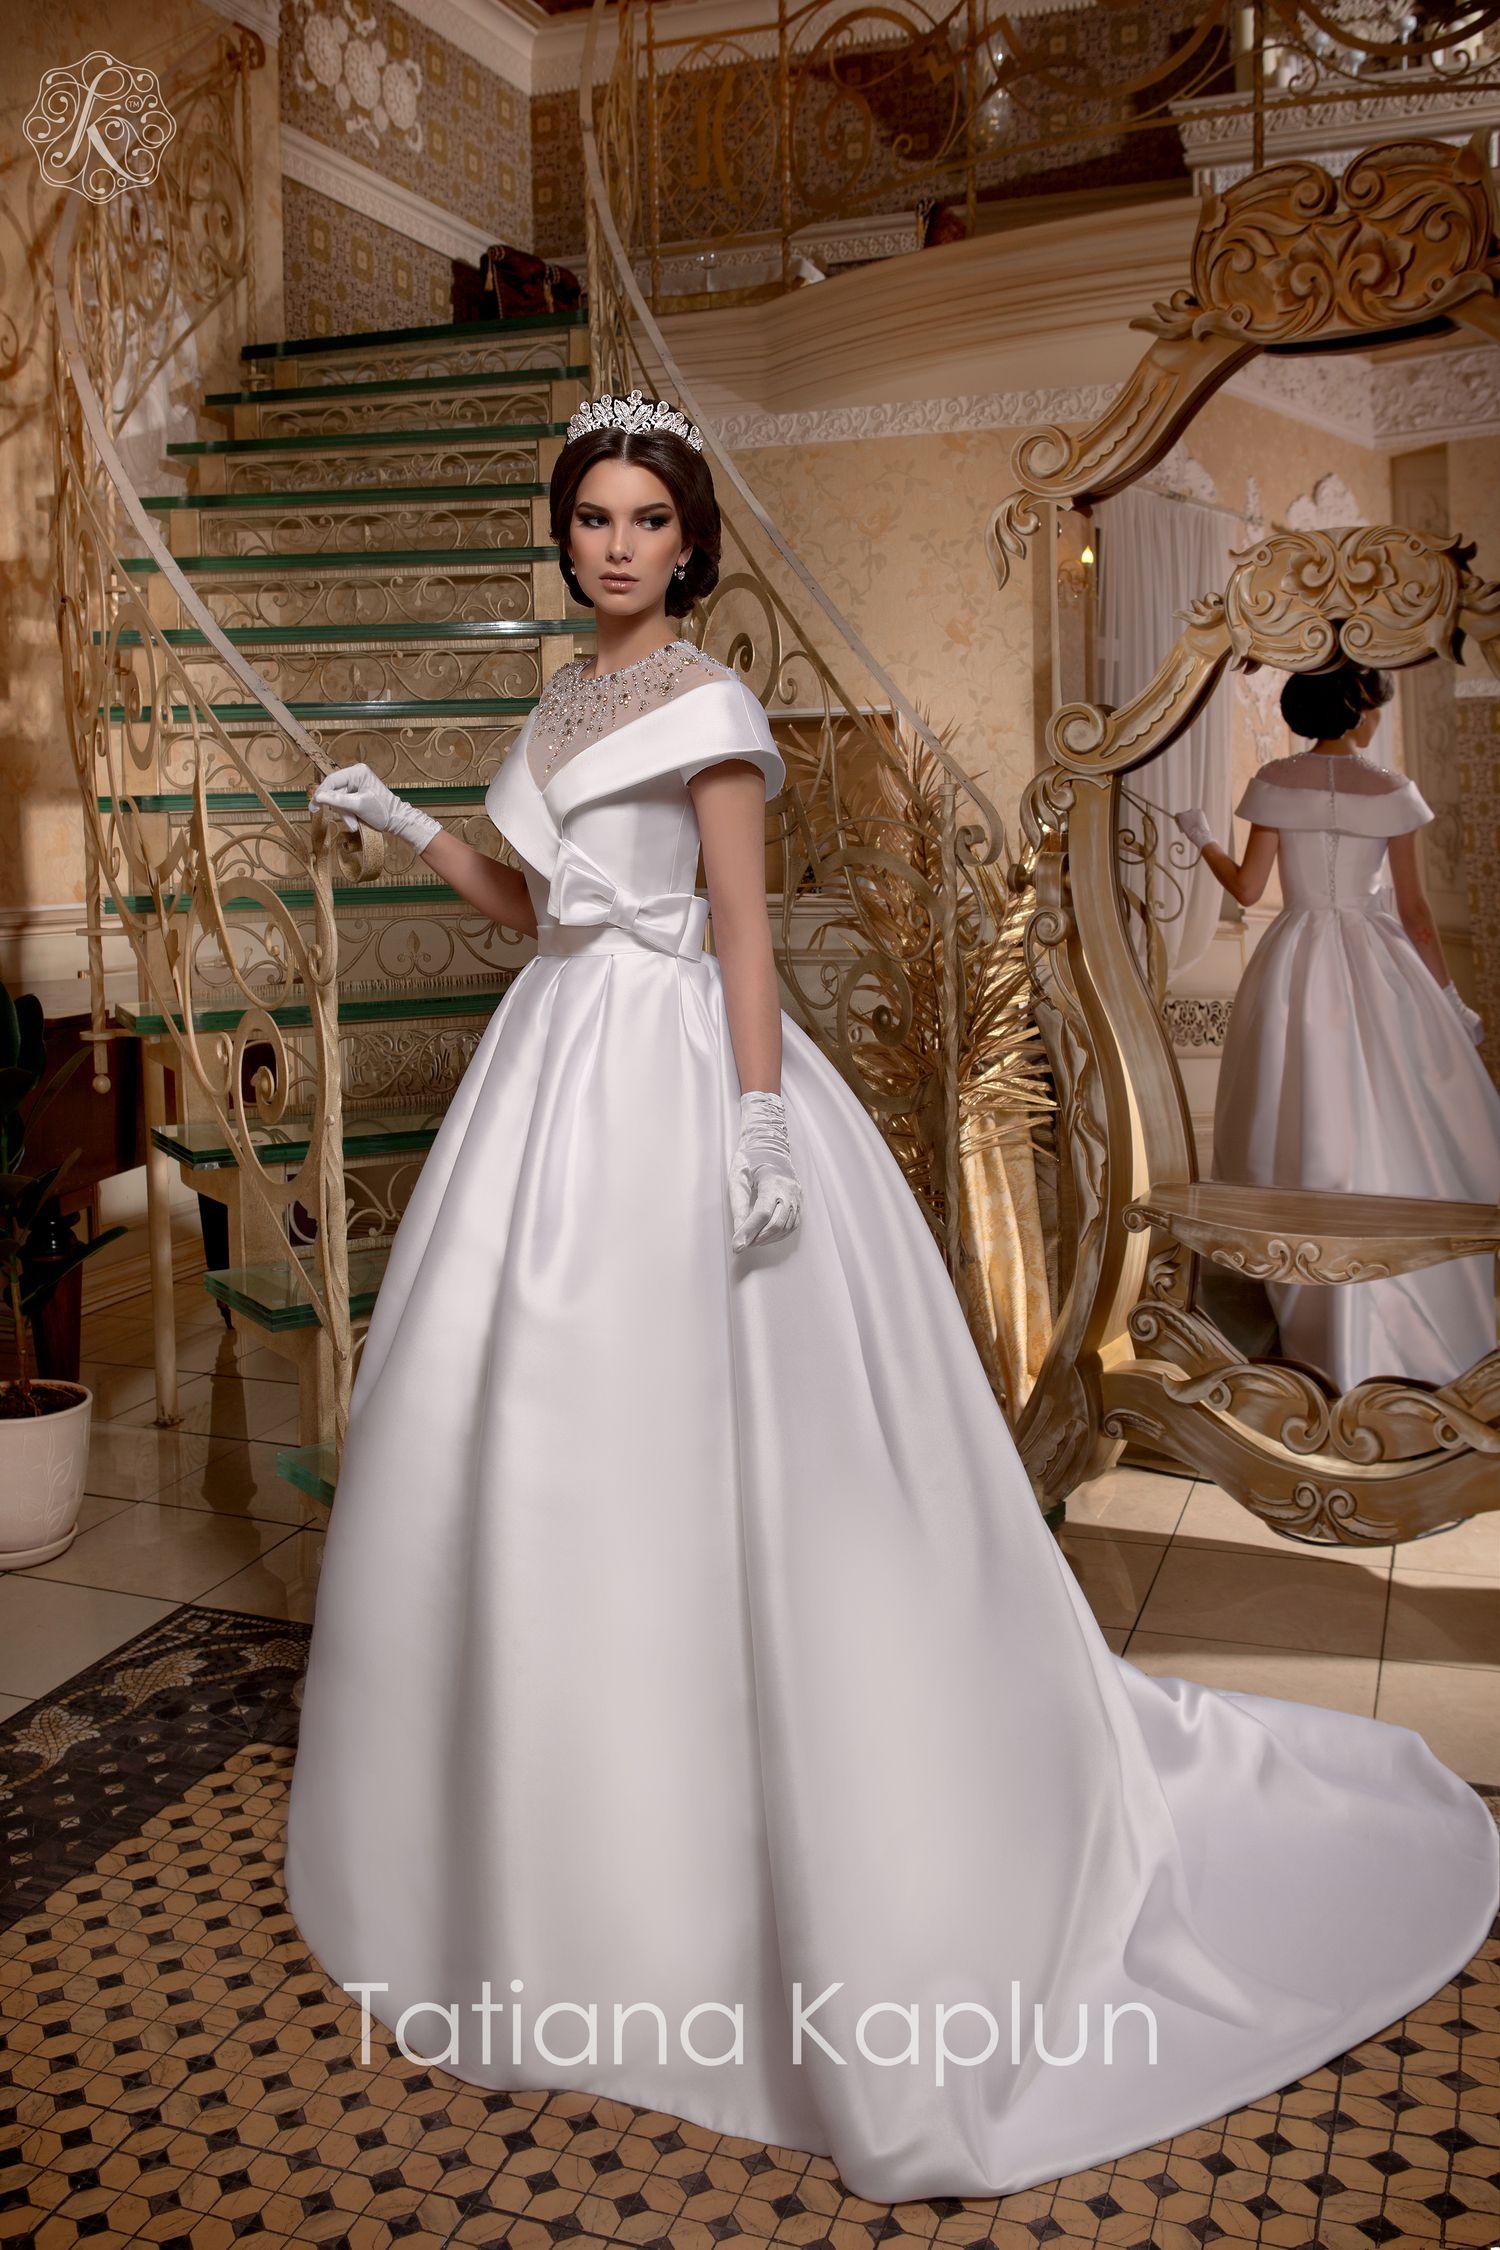 RUFFA Dress By TATIANA KAPLUN | BEST WEDDING DRESSES in TAMPA BAY ...